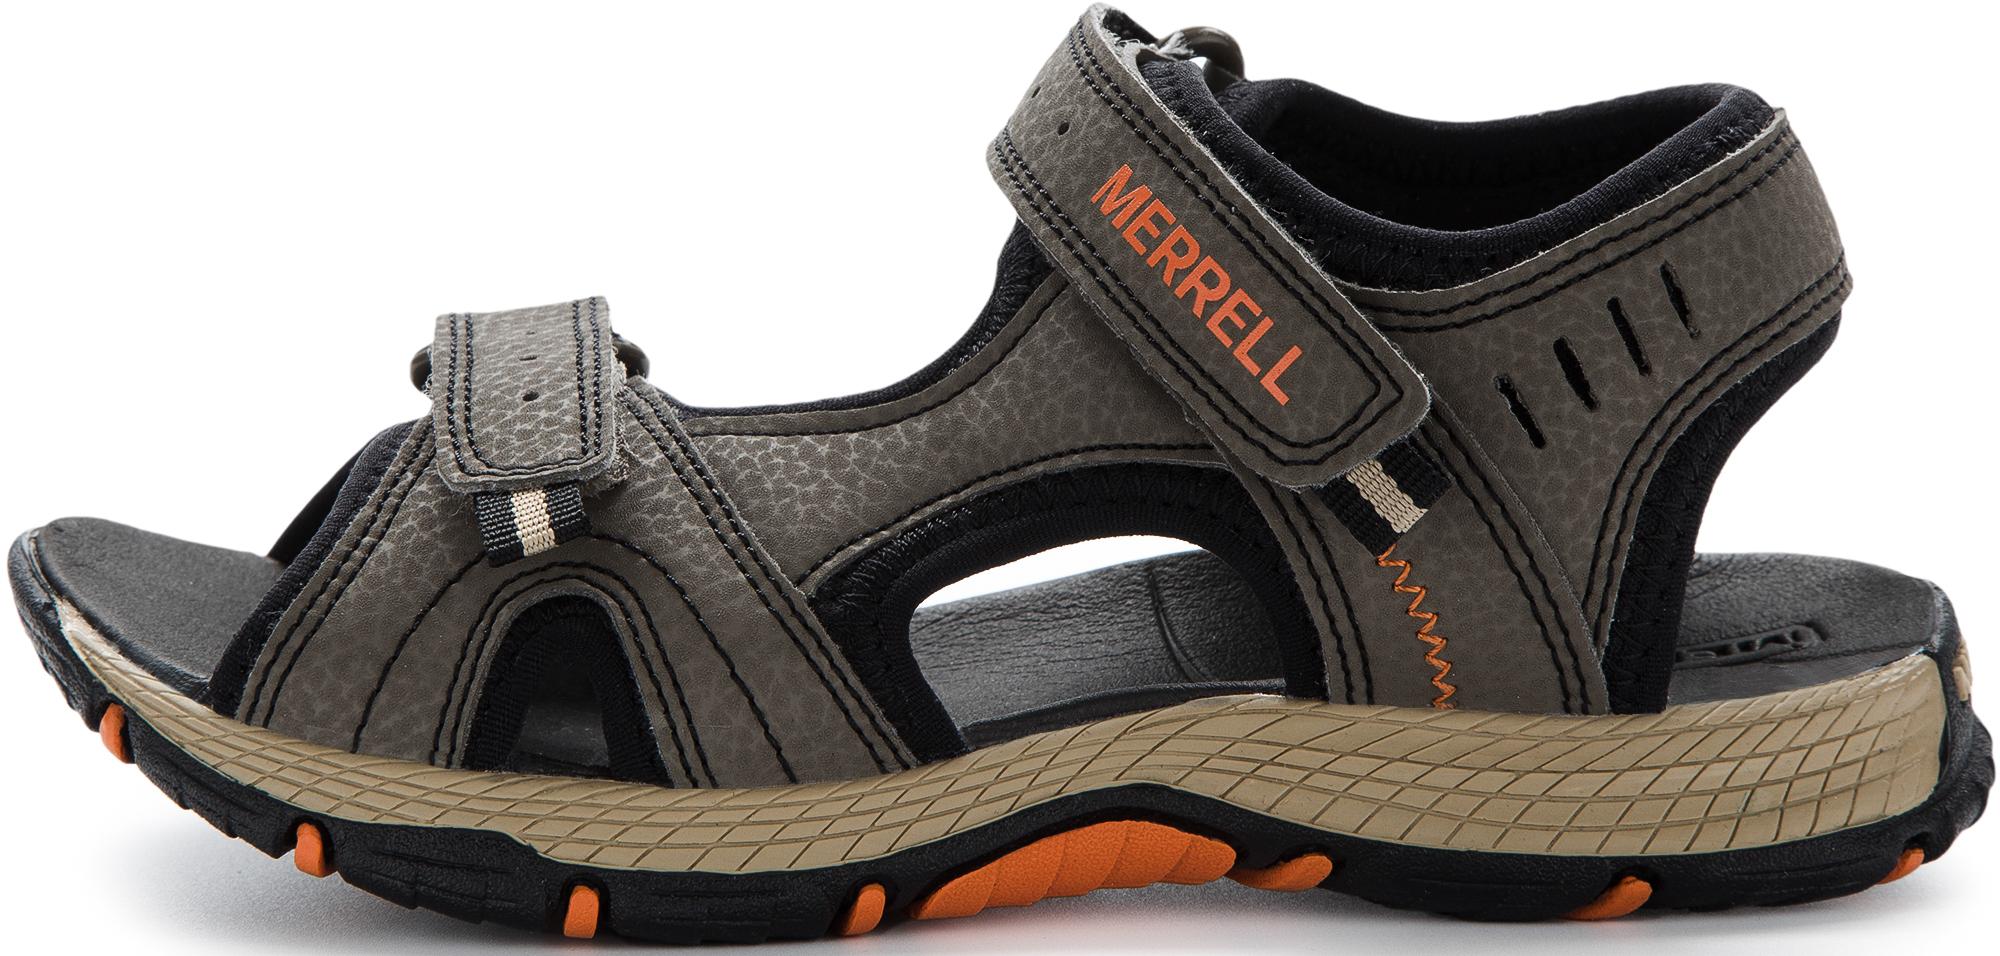 Merrell Сандалии для мальчиков Merrell Panther, размер 33 цена